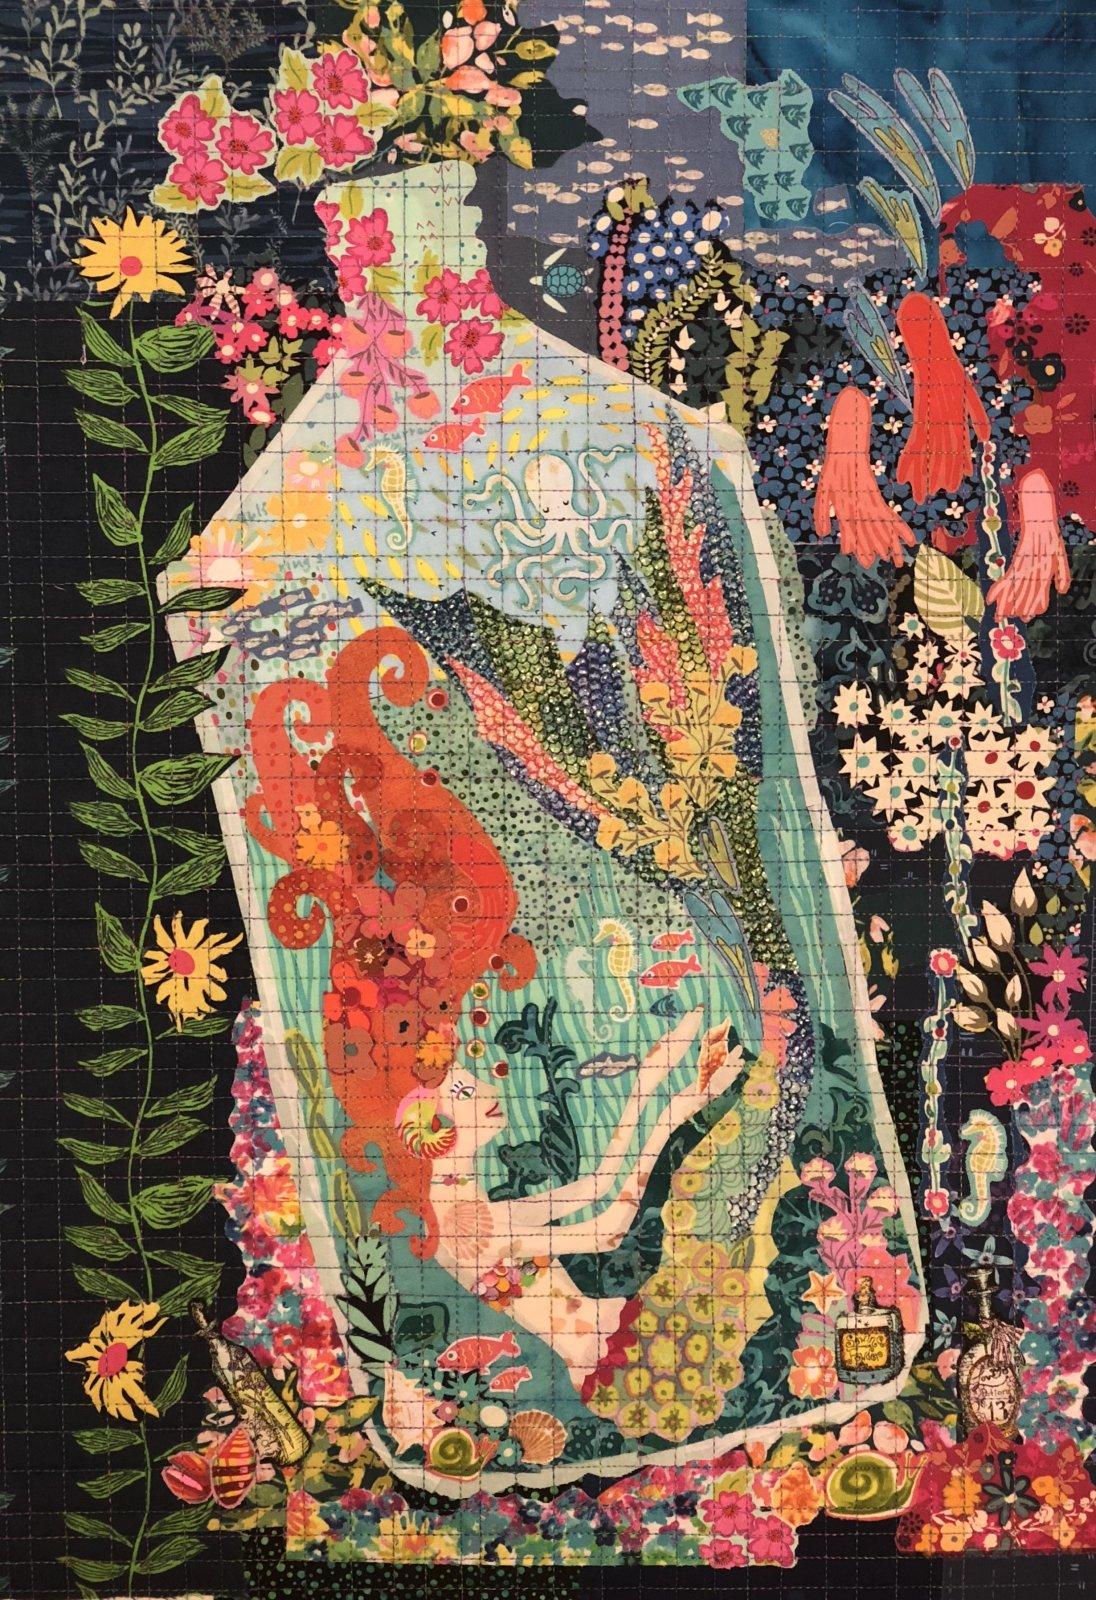 Teeny Tiny #4 Collage Kit Mermaid by Laura Heine